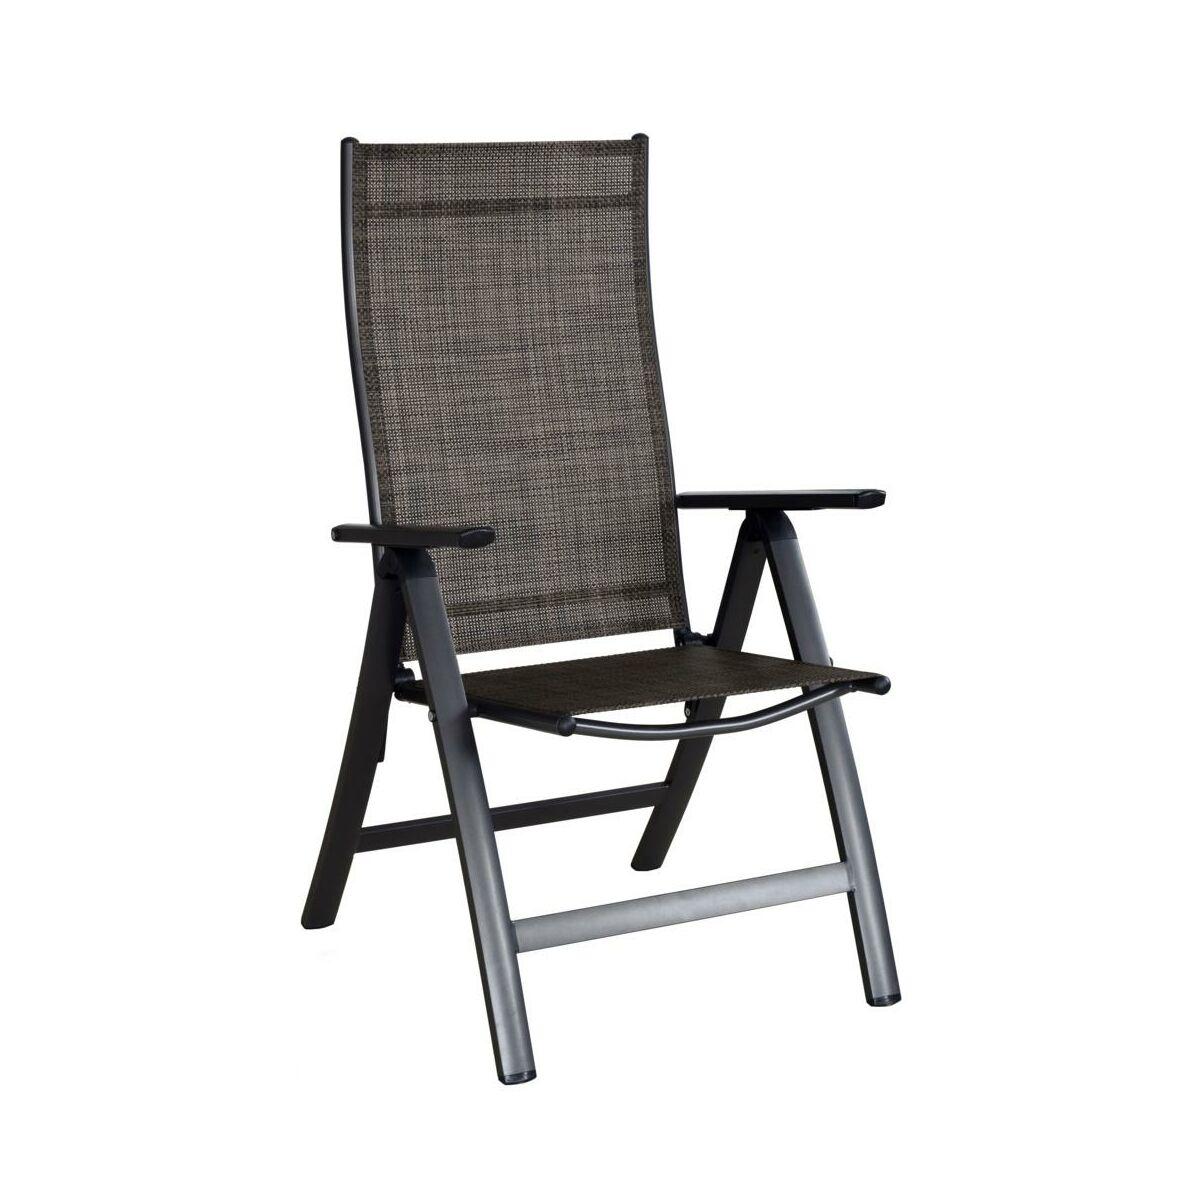 krzes o ogrodowe london 59 cm x 62 cm sun garden krzes a i fotele ogrodowe w atrakcyjnej. Black Bedroom Furniture Sets. Home Design Ideas